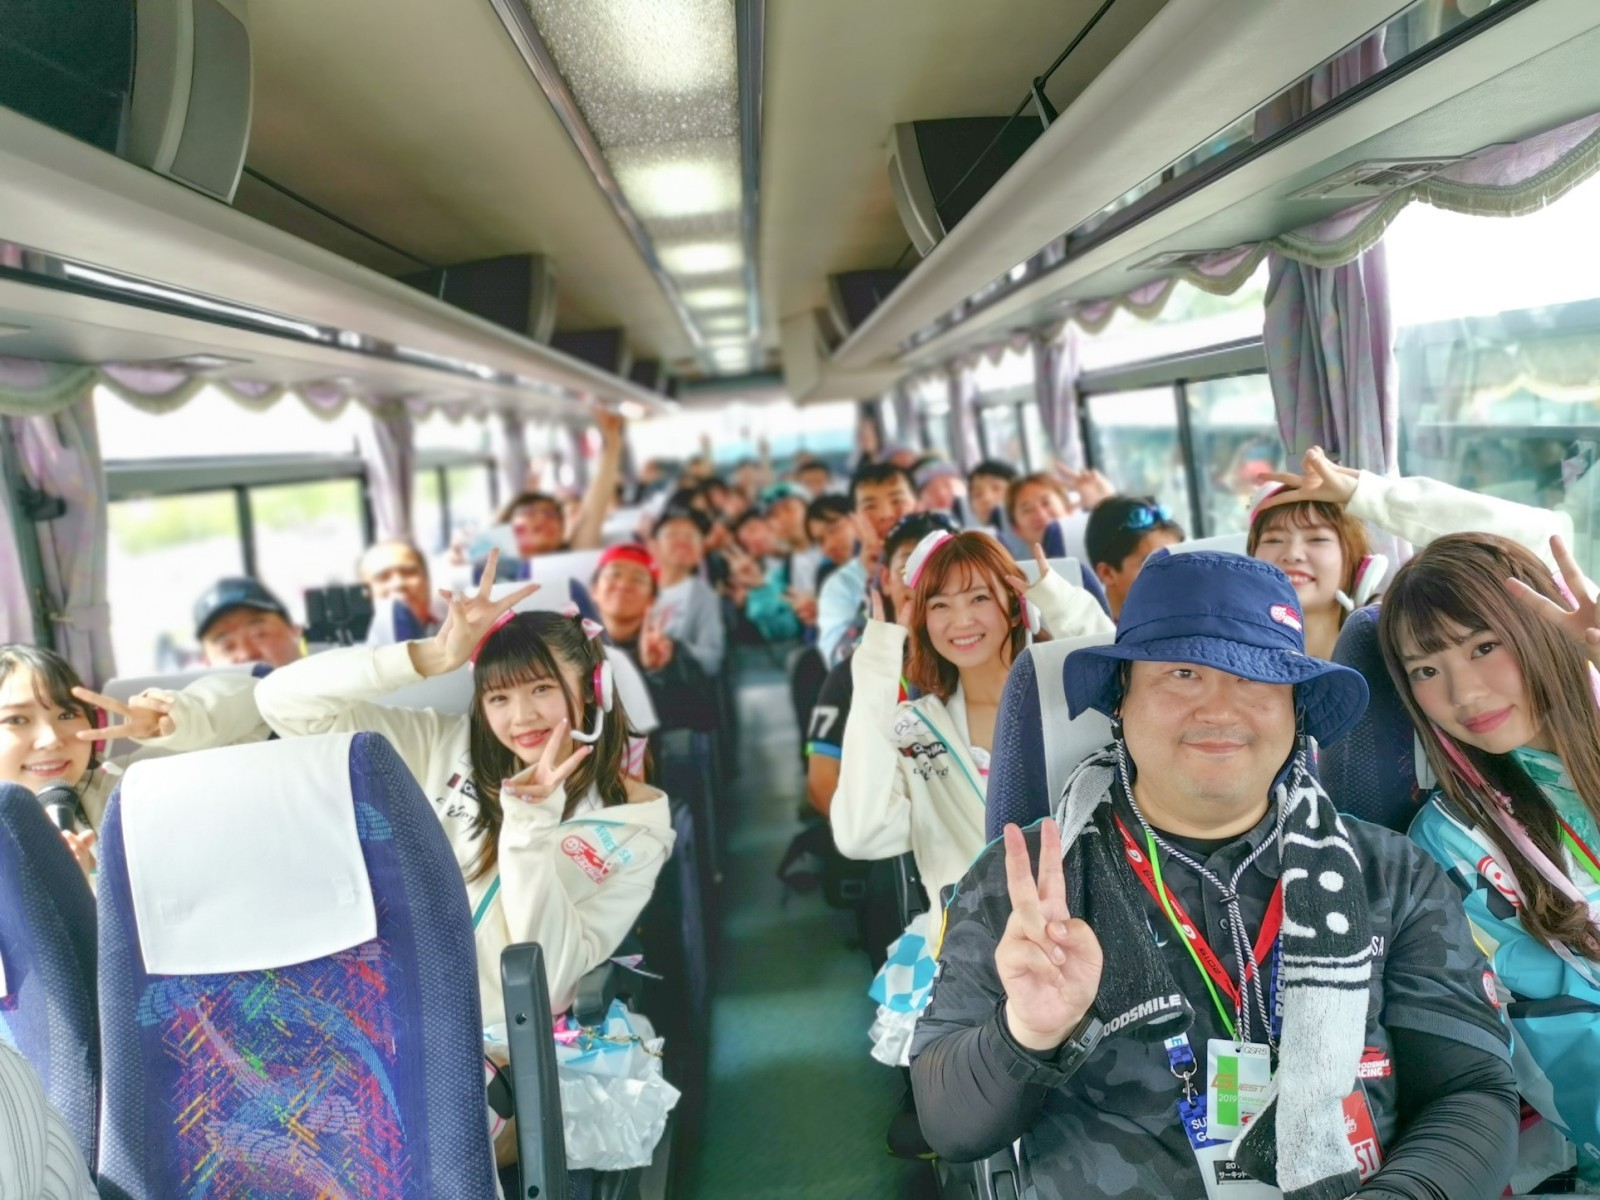 【SUPER GT Round5 富士】 サーキットサファリとミクサポ撮影会のお知らせ_e0379343_12031228.jpeg